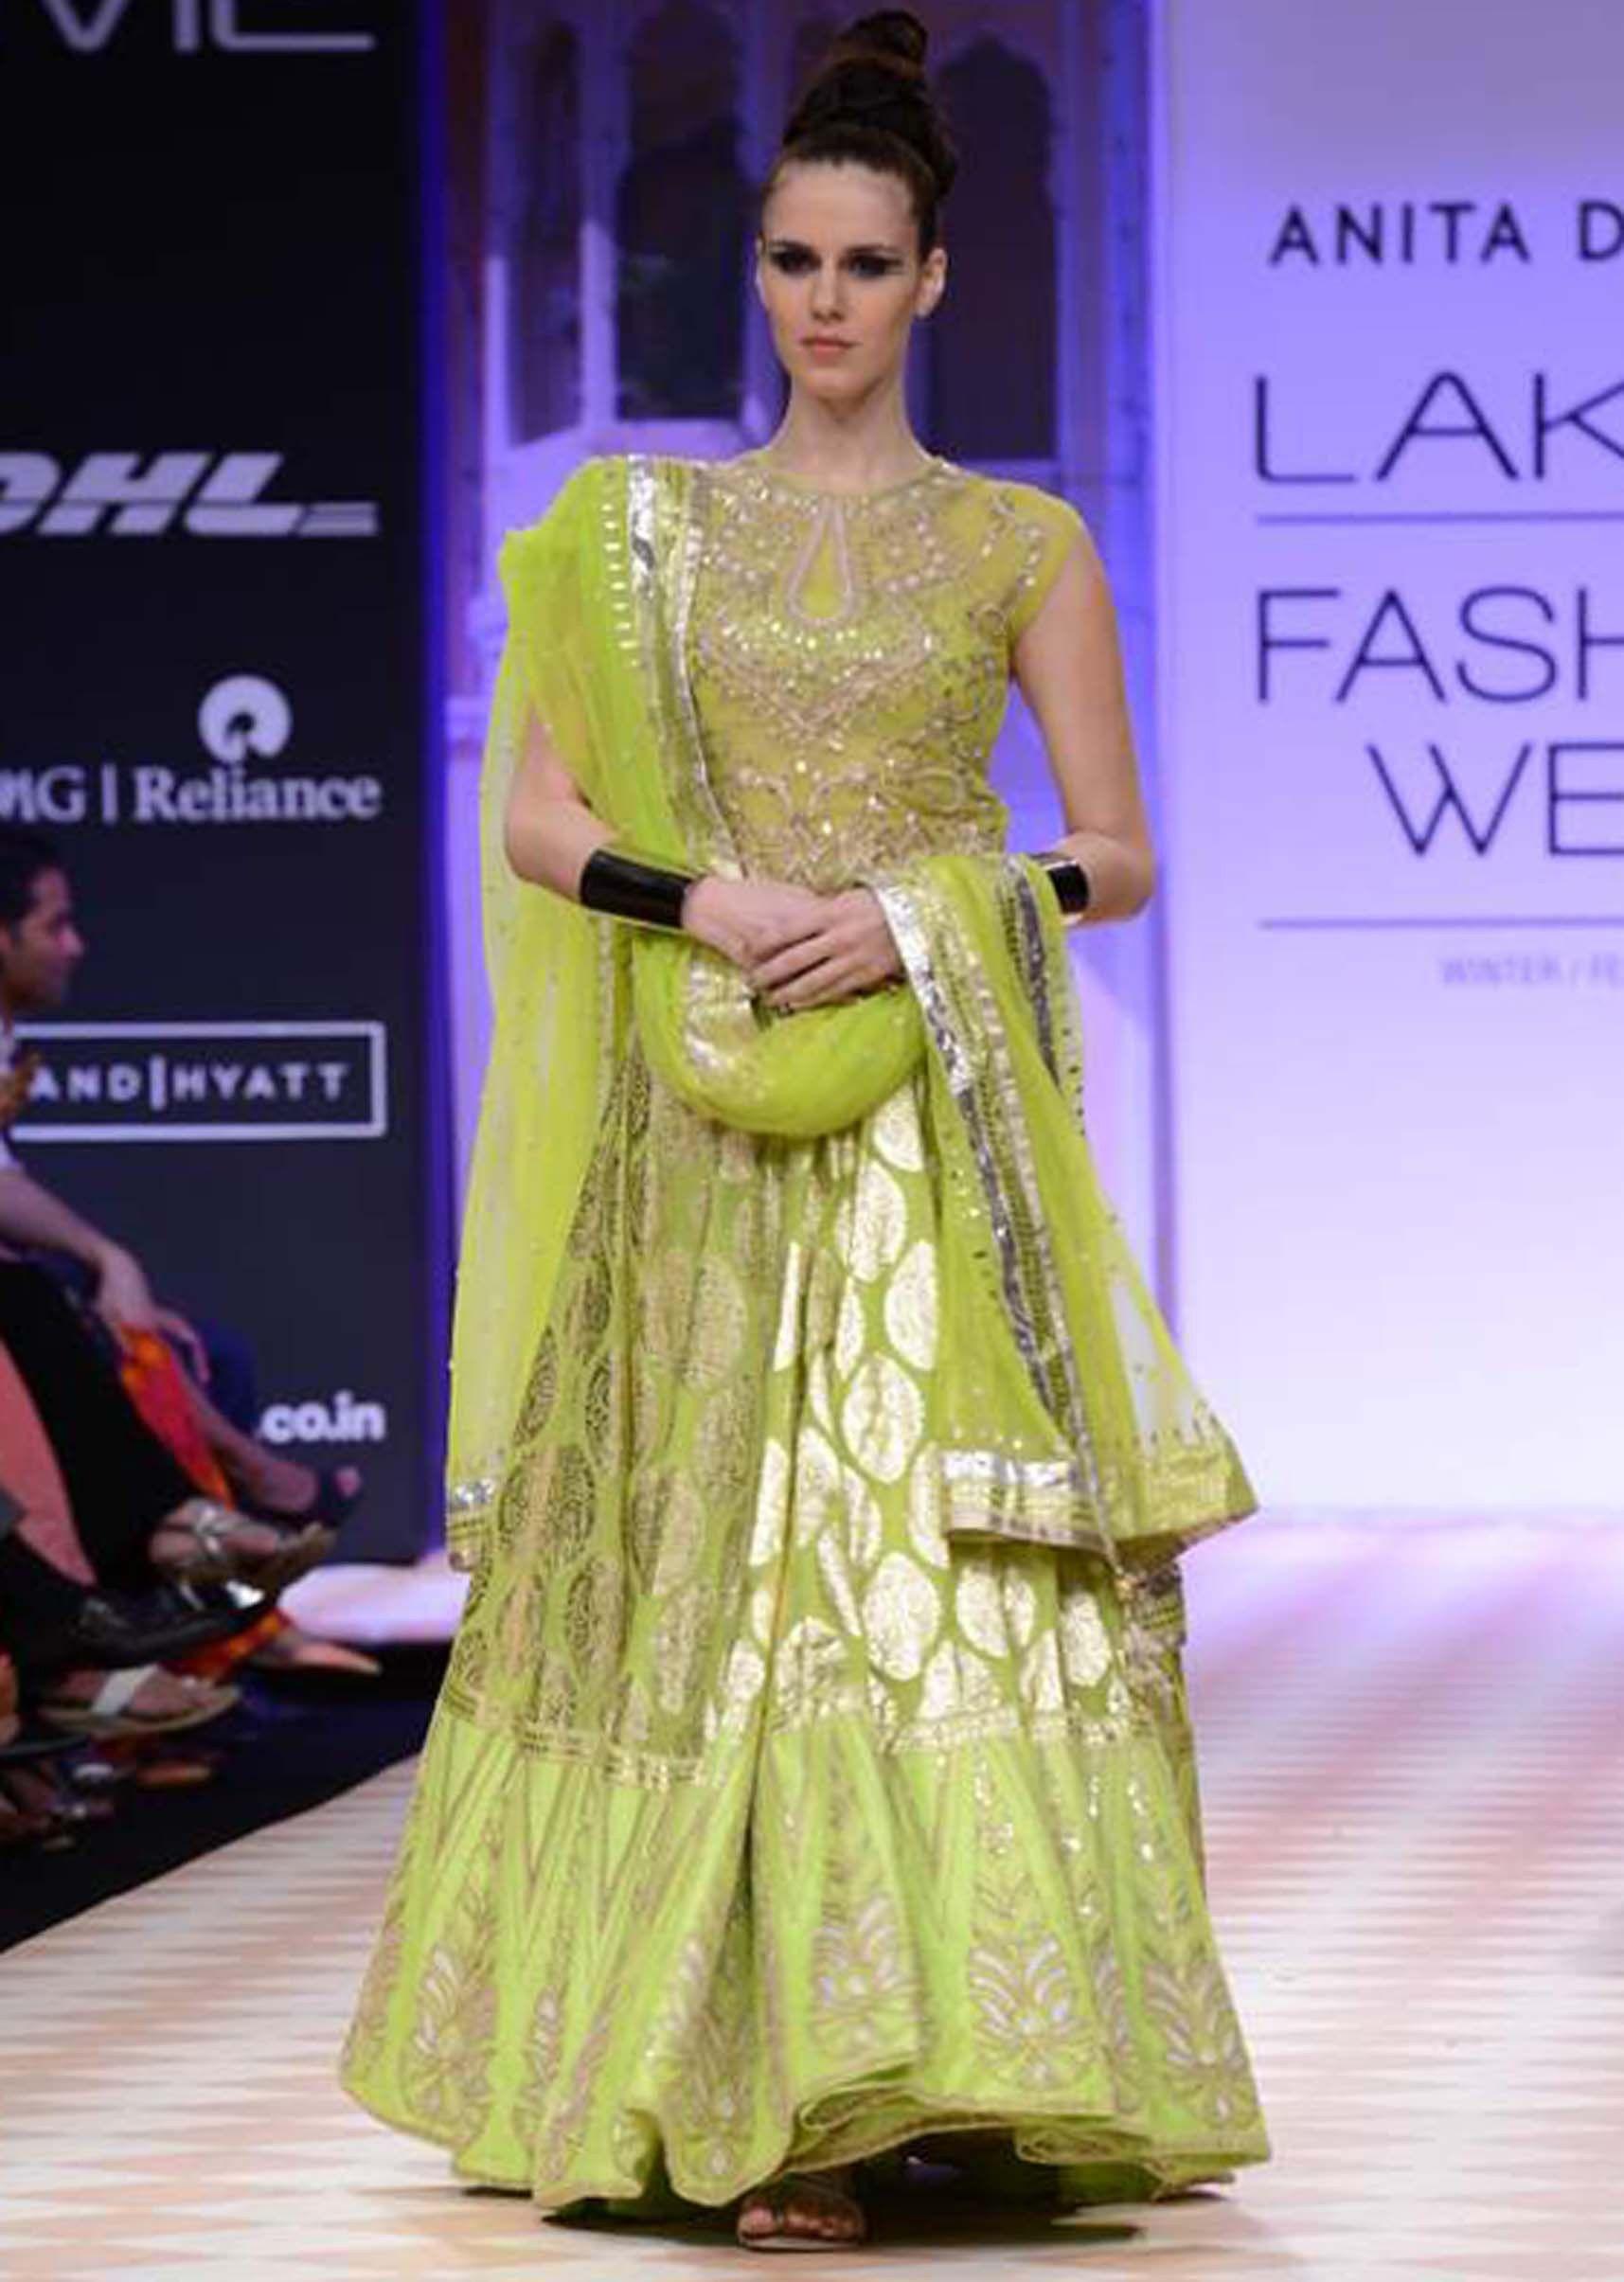 adba75c76bb Anita Dongre royal collection at Lakme Fashion Week Winter Festival 2013 SN  29